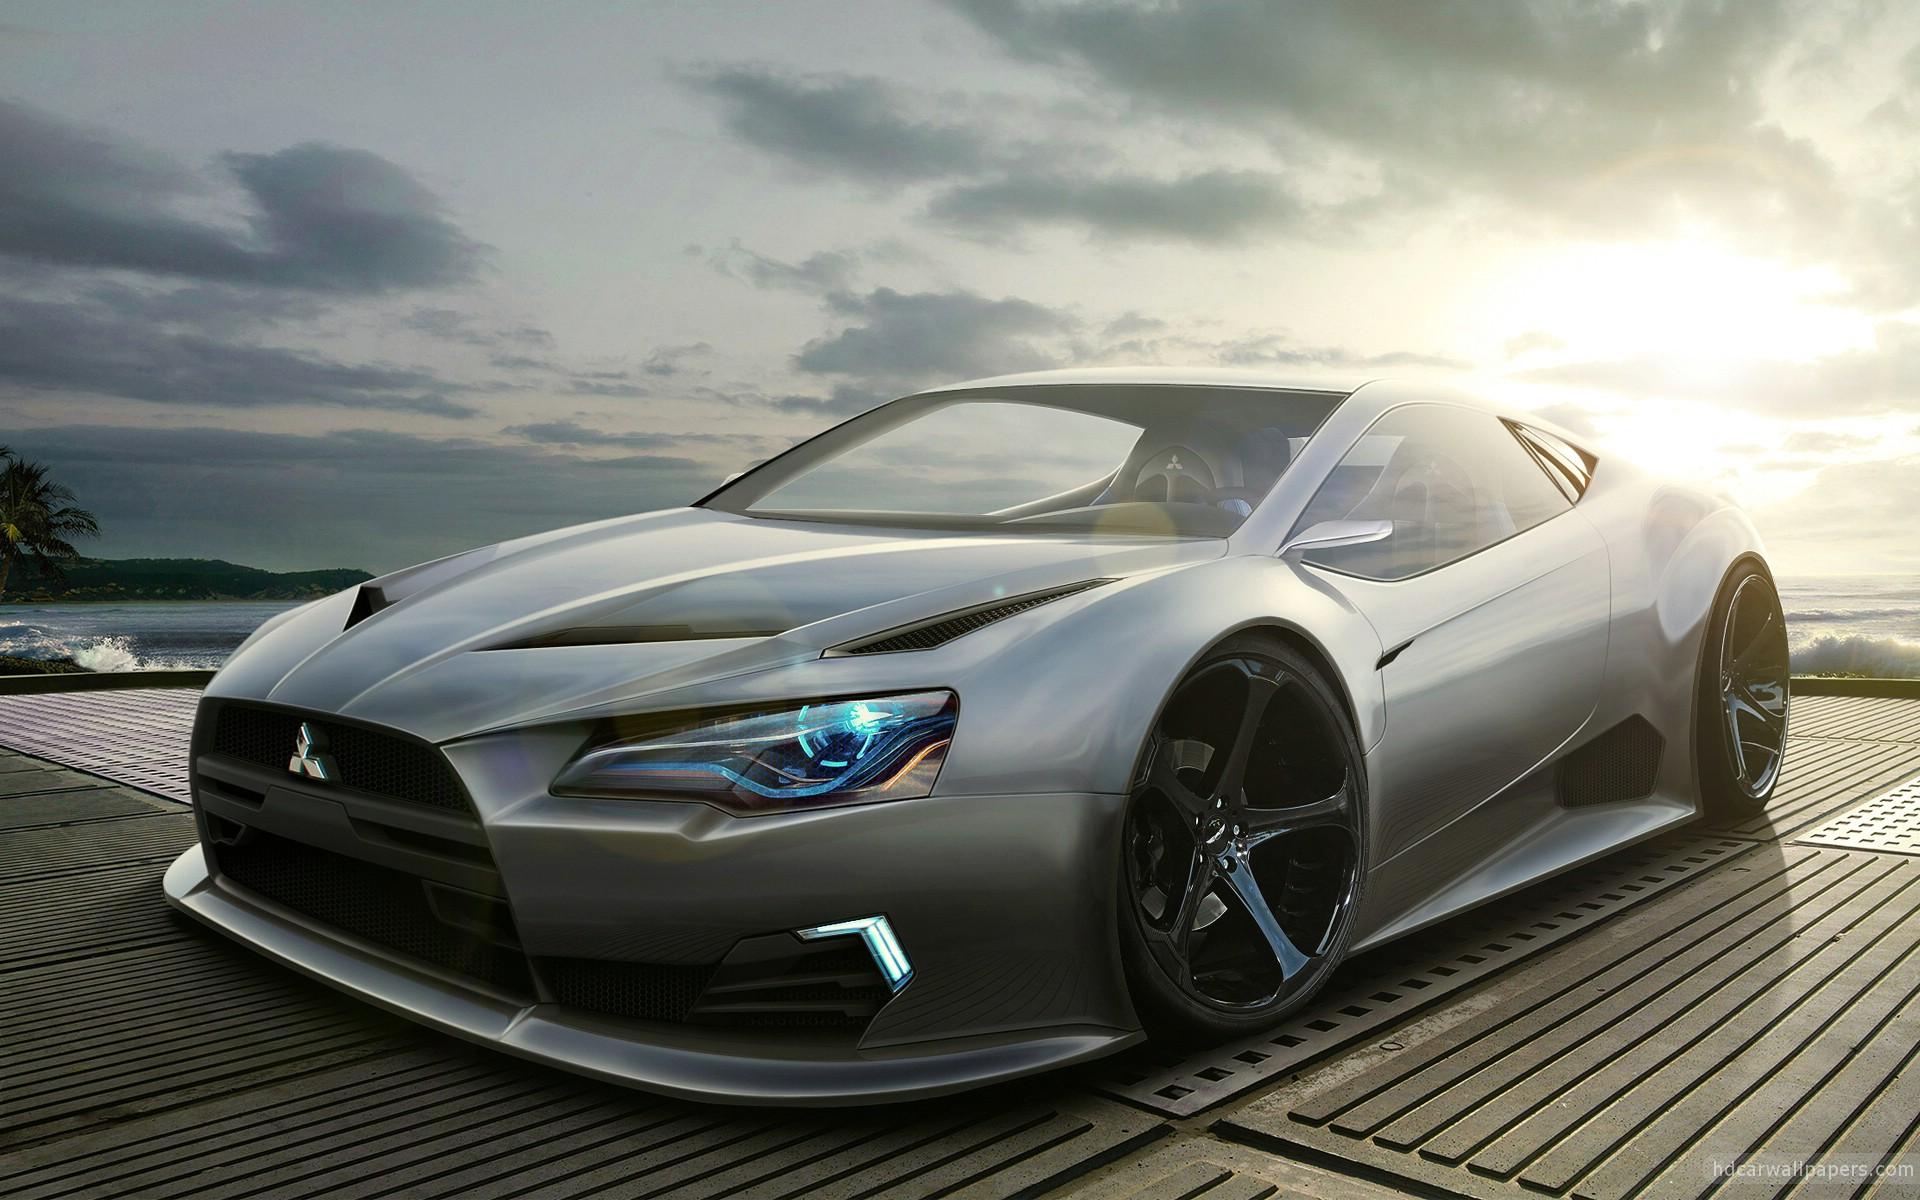 Hd wallpapers of cars - Mitsubishi Concept Wallpaper Hd Car Wallpapers